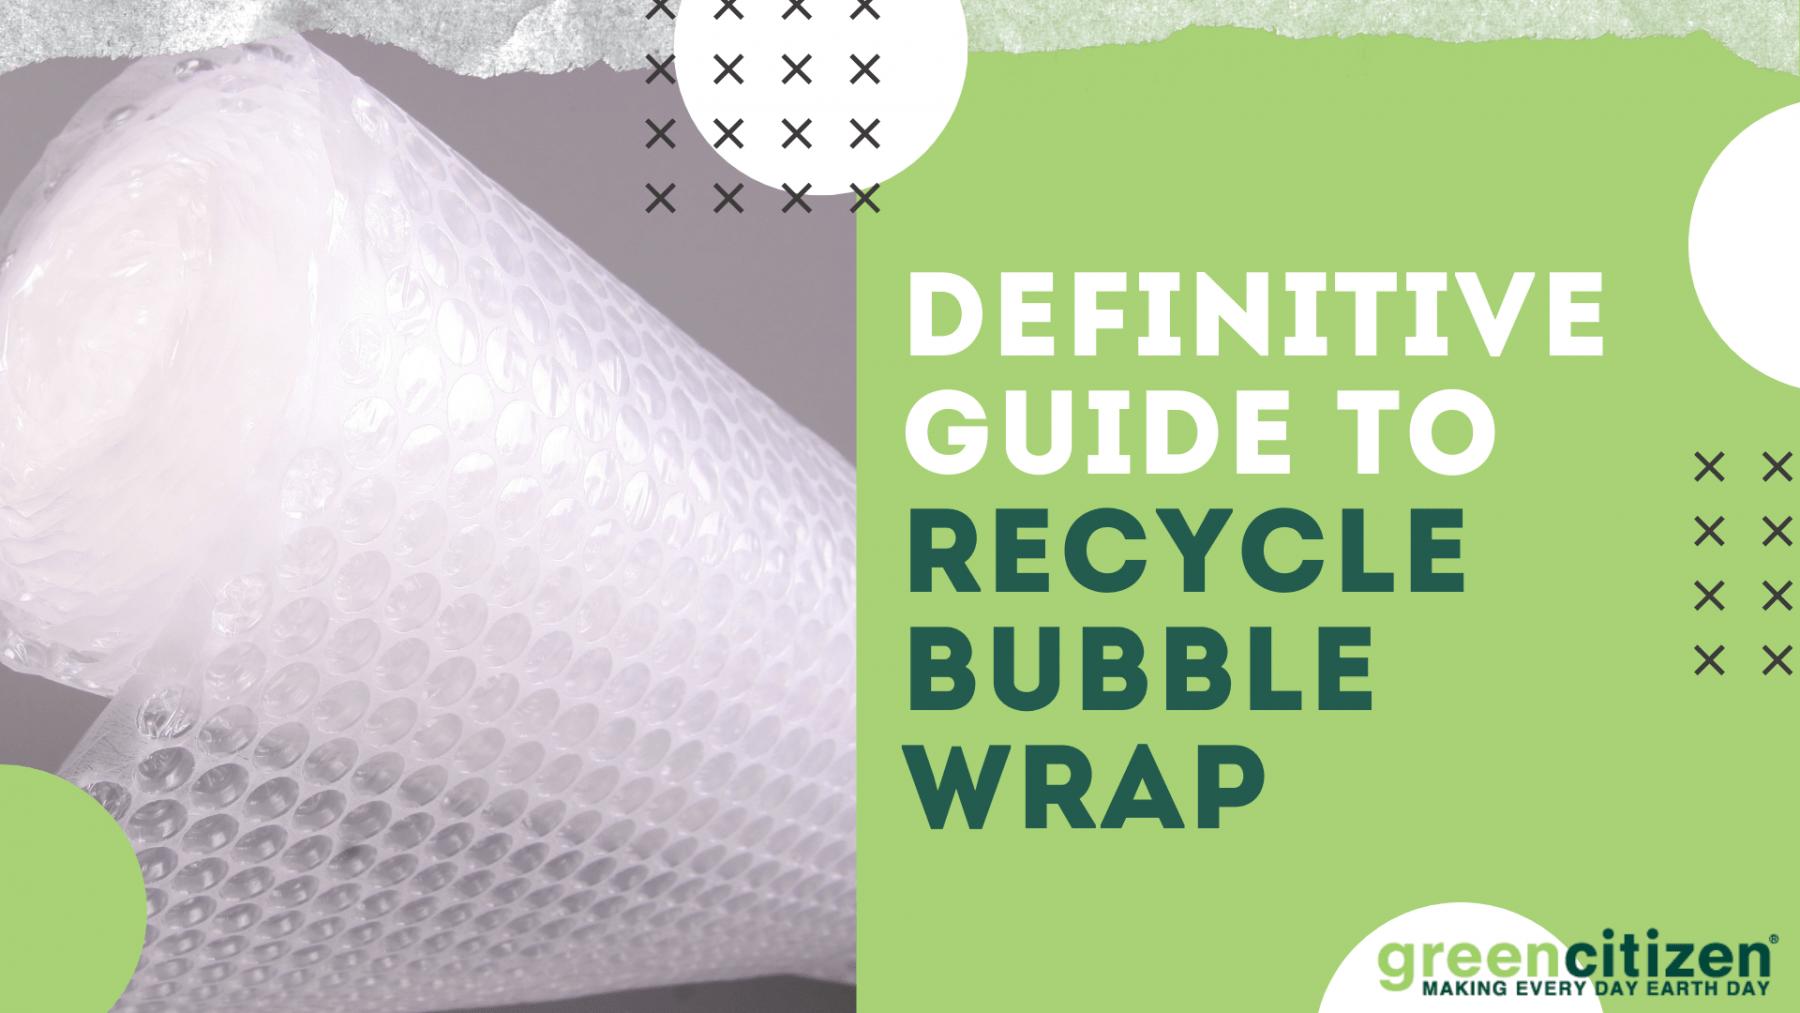 Recycle Bubble Wrap